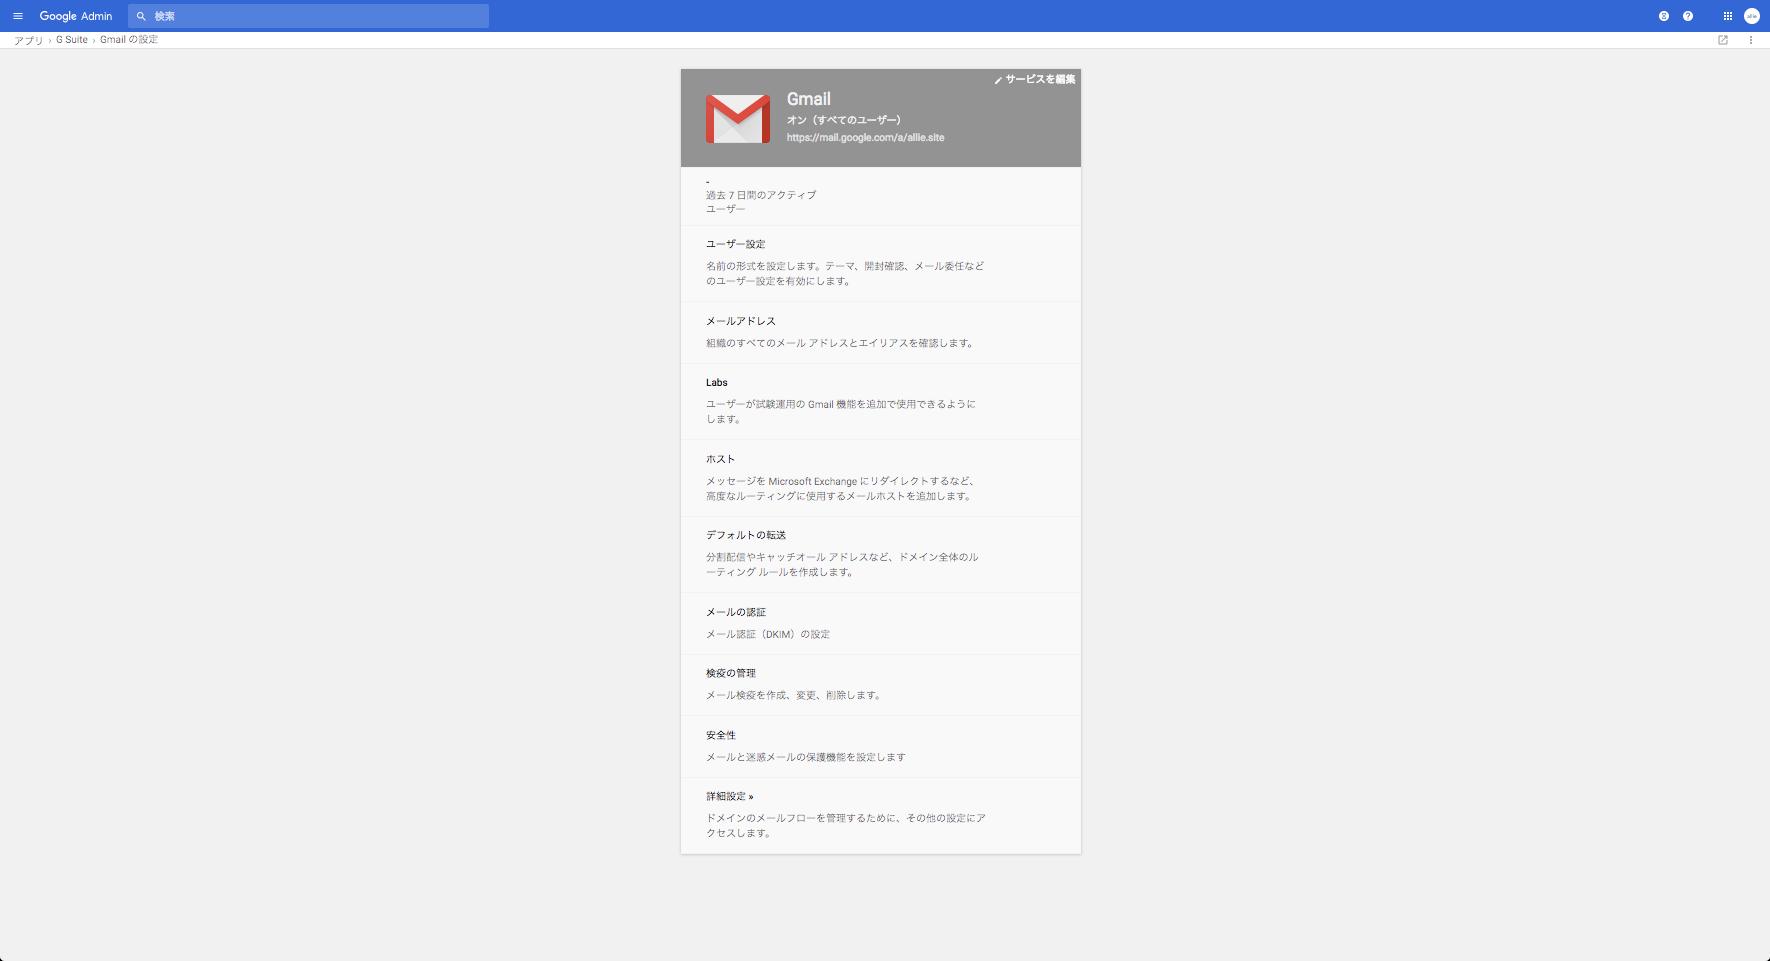 Google 管理コンソール - Gmail